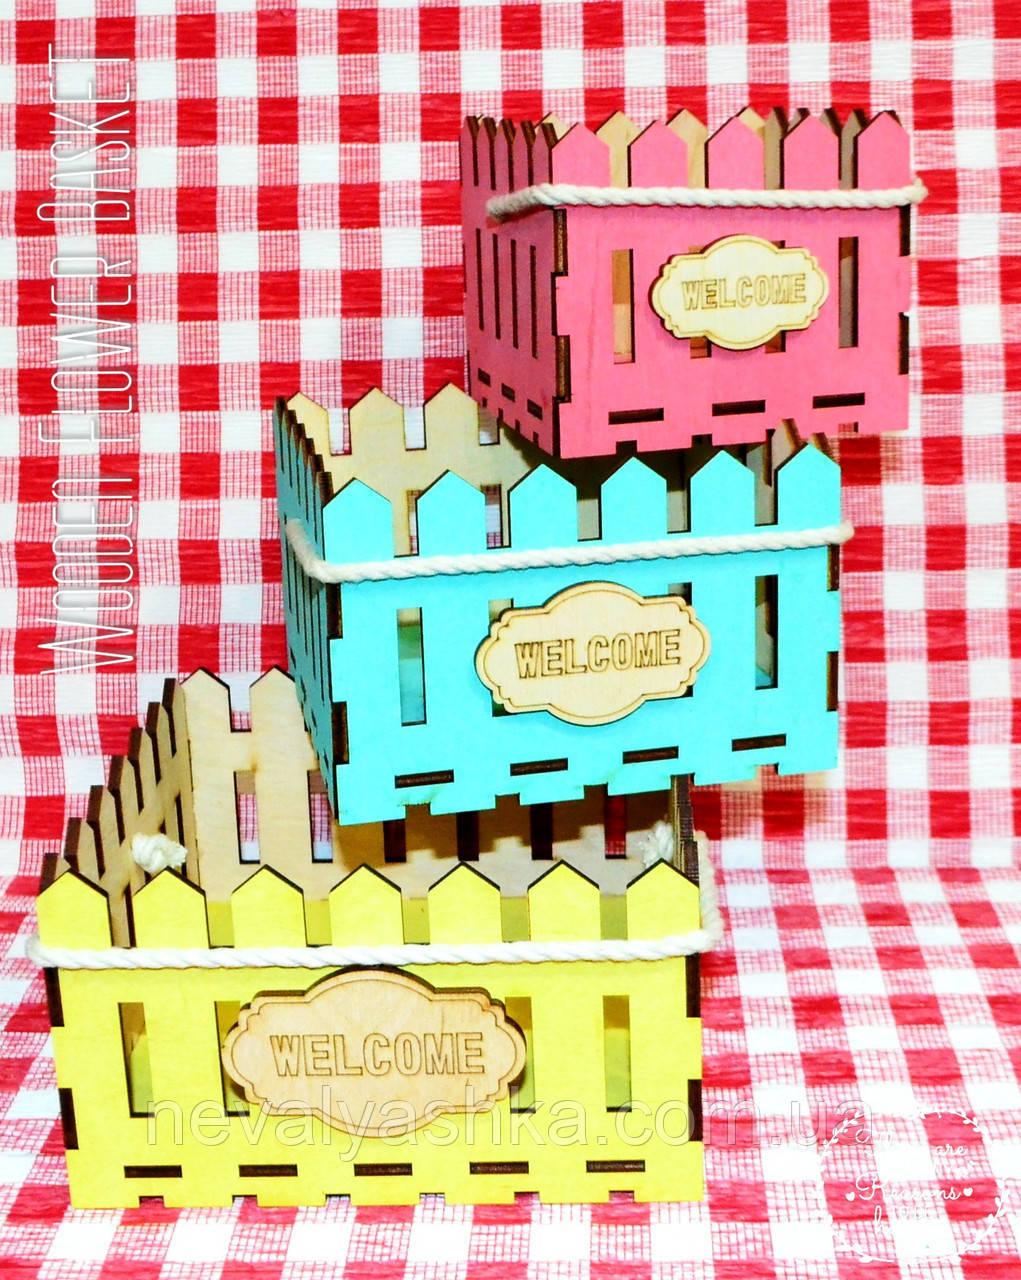 Декоративная Деревянная Корзинка Большая Крашенная для цветов букетов дерев'яна корзина для квітів С ЛОГО